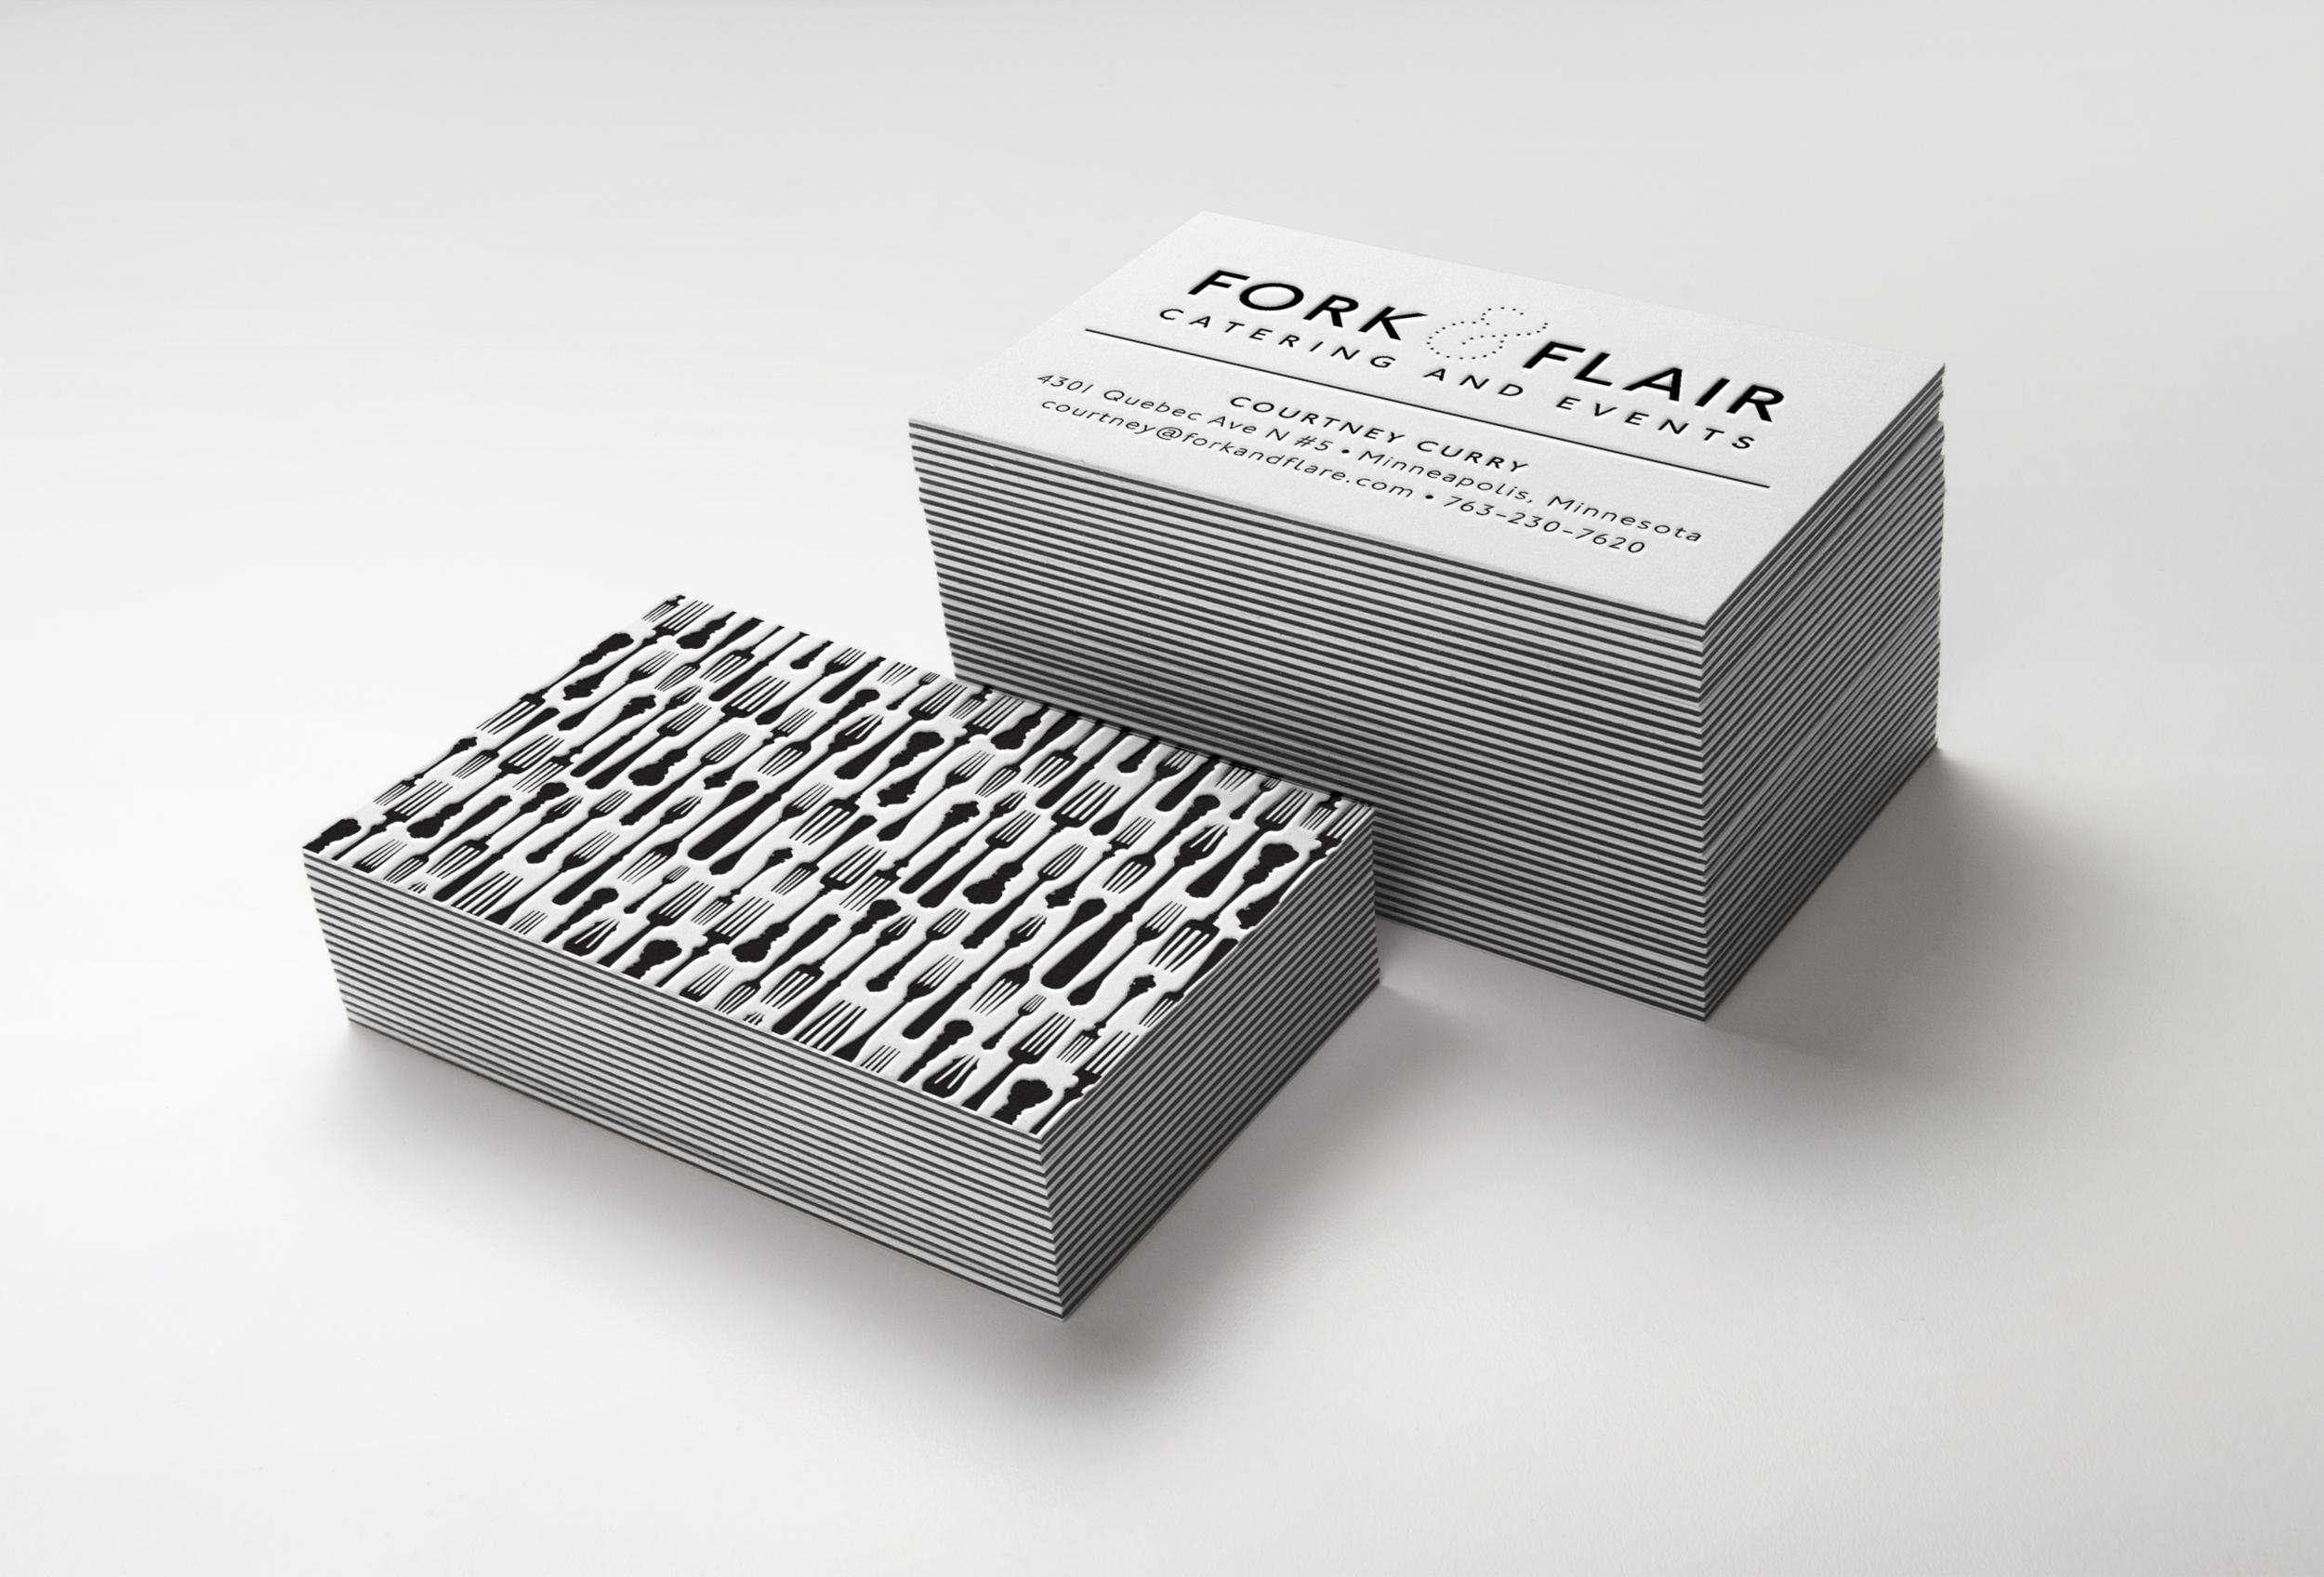 ff_businesscard02.jpg